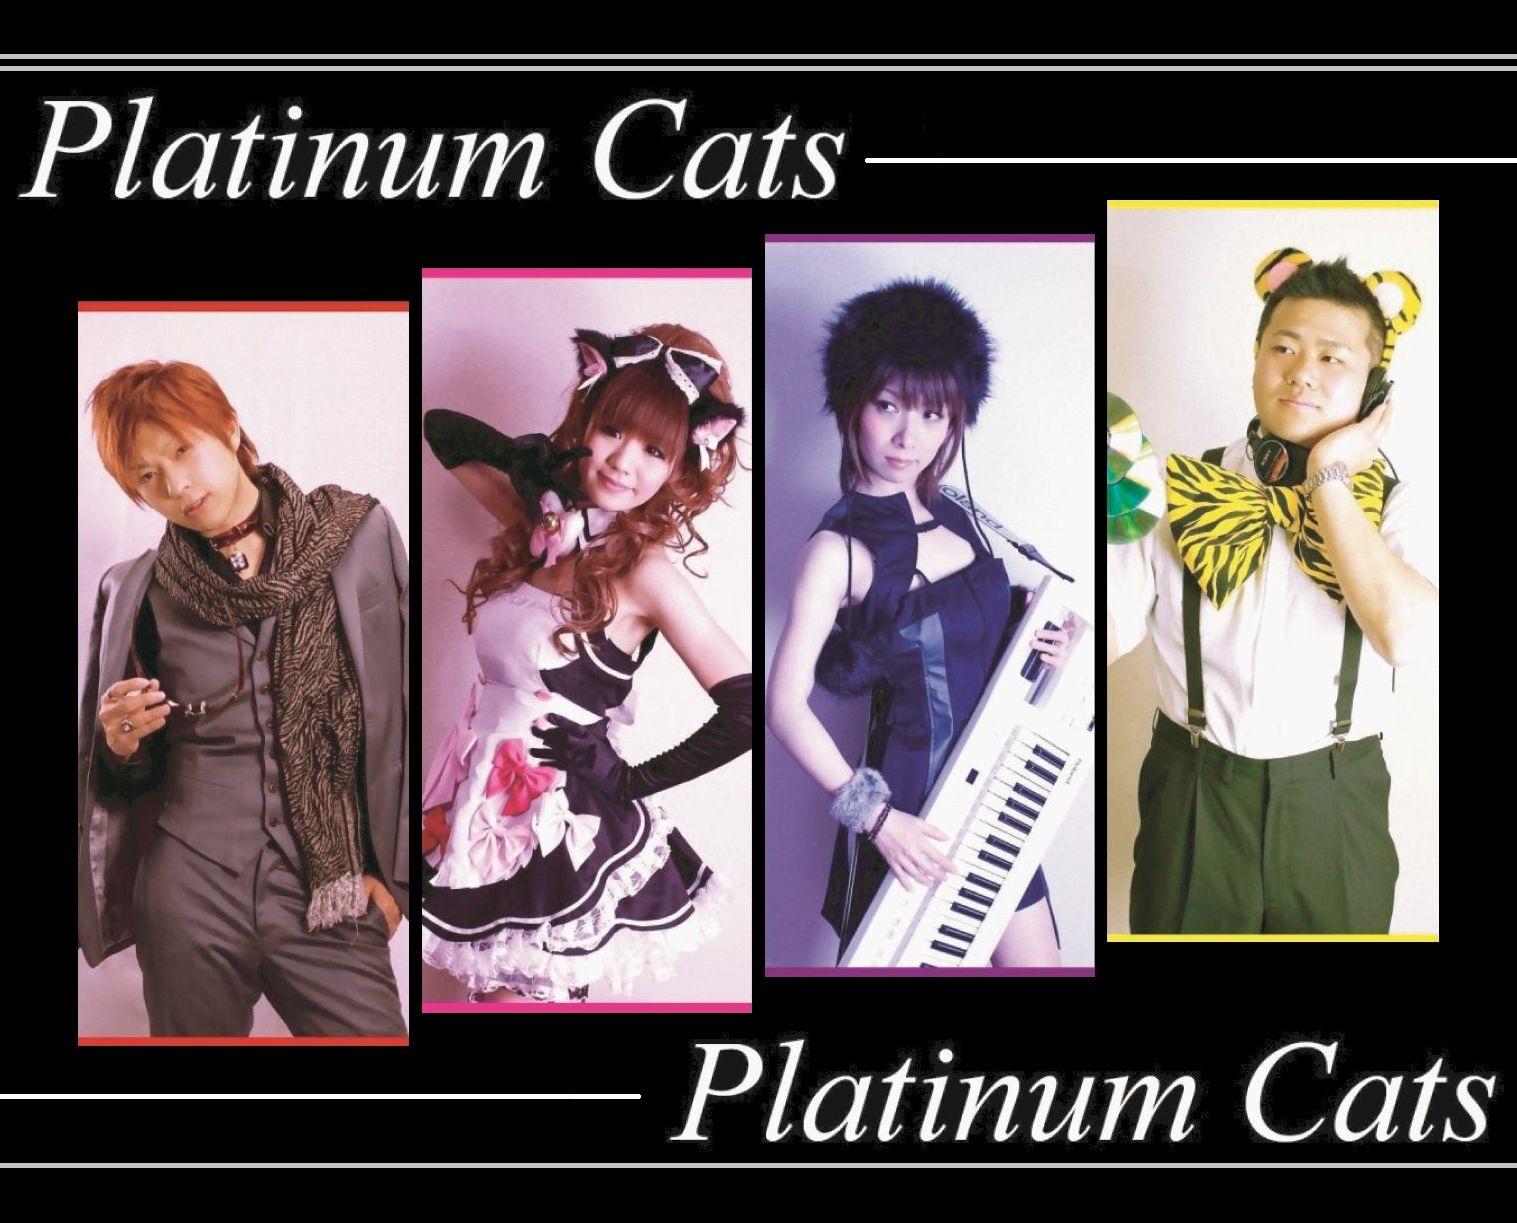 platinumcats.jpg